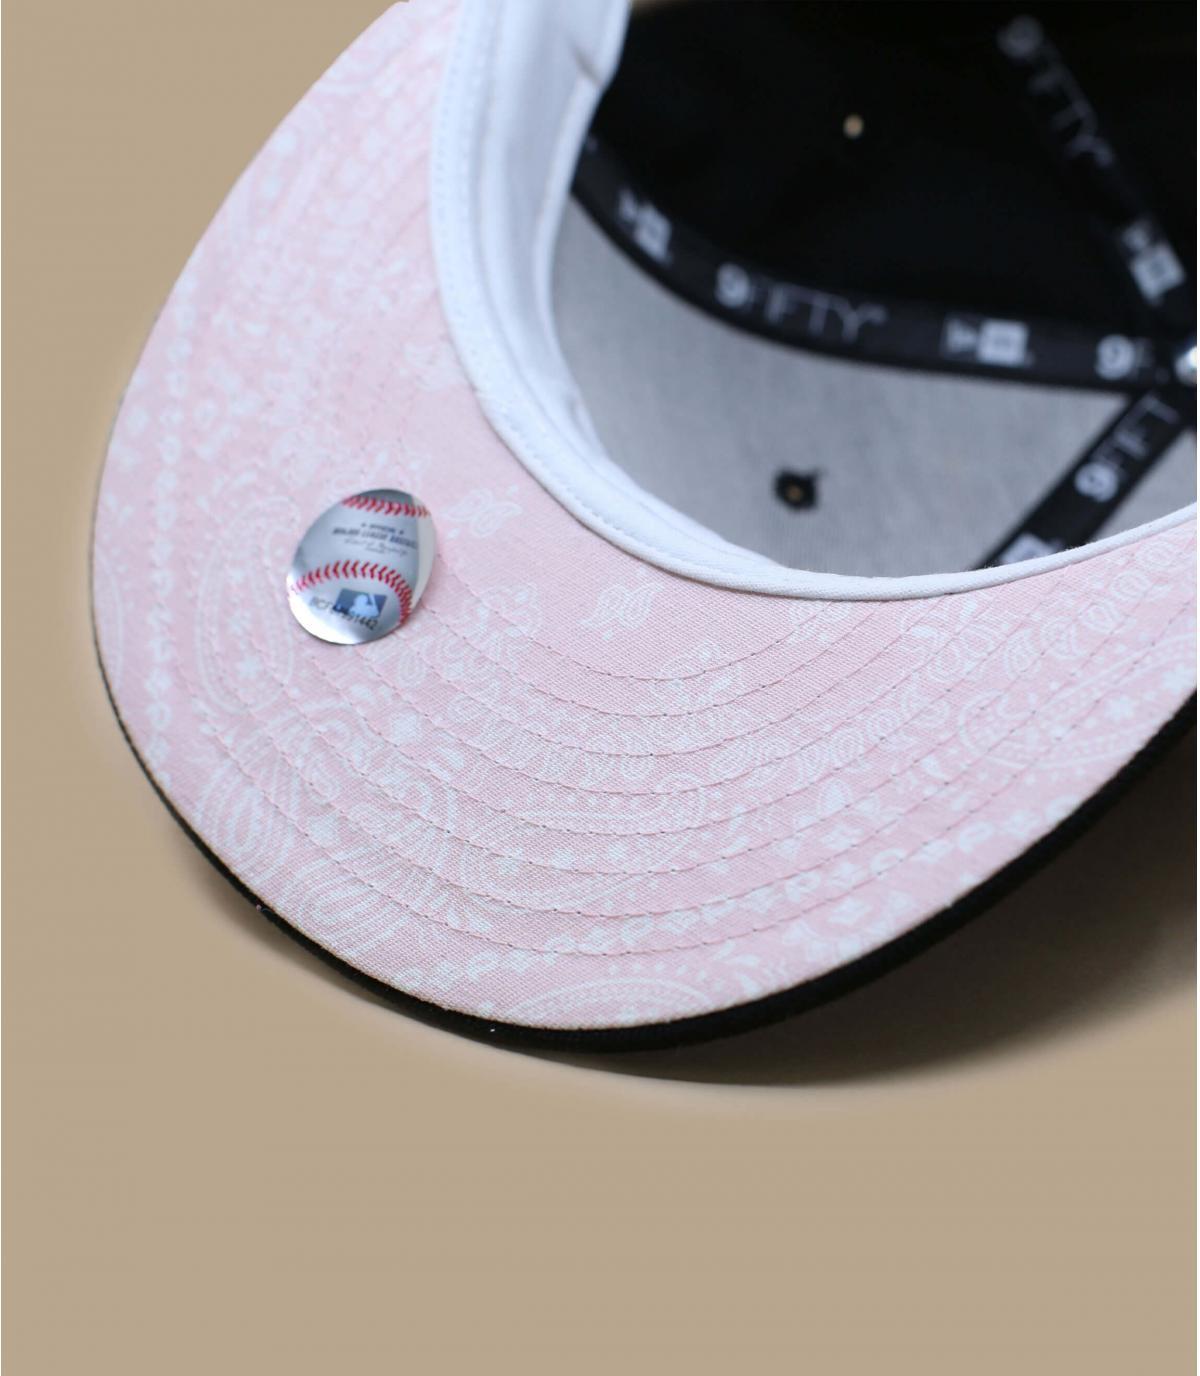 Détails Quickturn Paisley NY 950 black pink - image 5